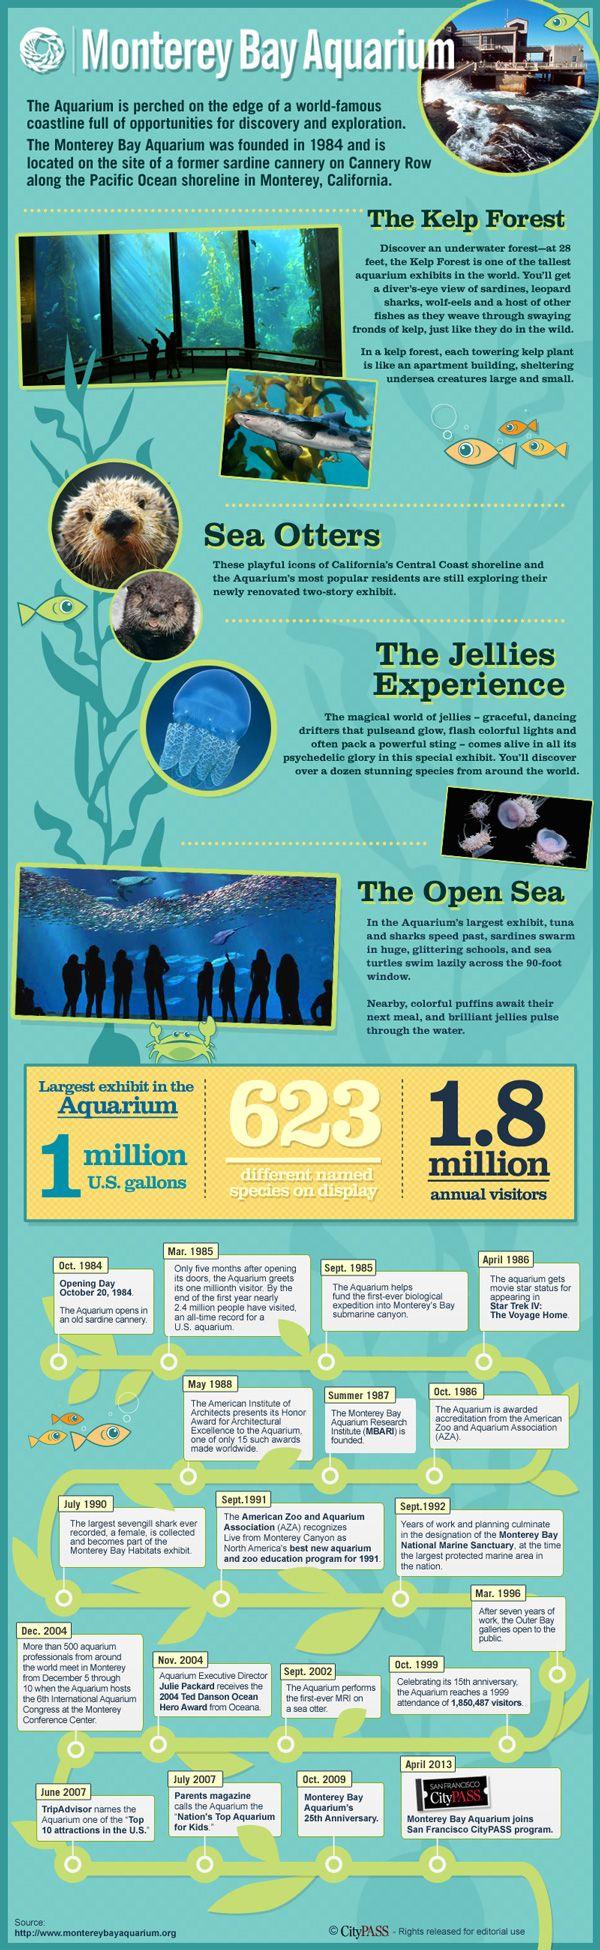 City Traveler Blog: Monterey Bay Aquarium, Newest CityPASS Attraction